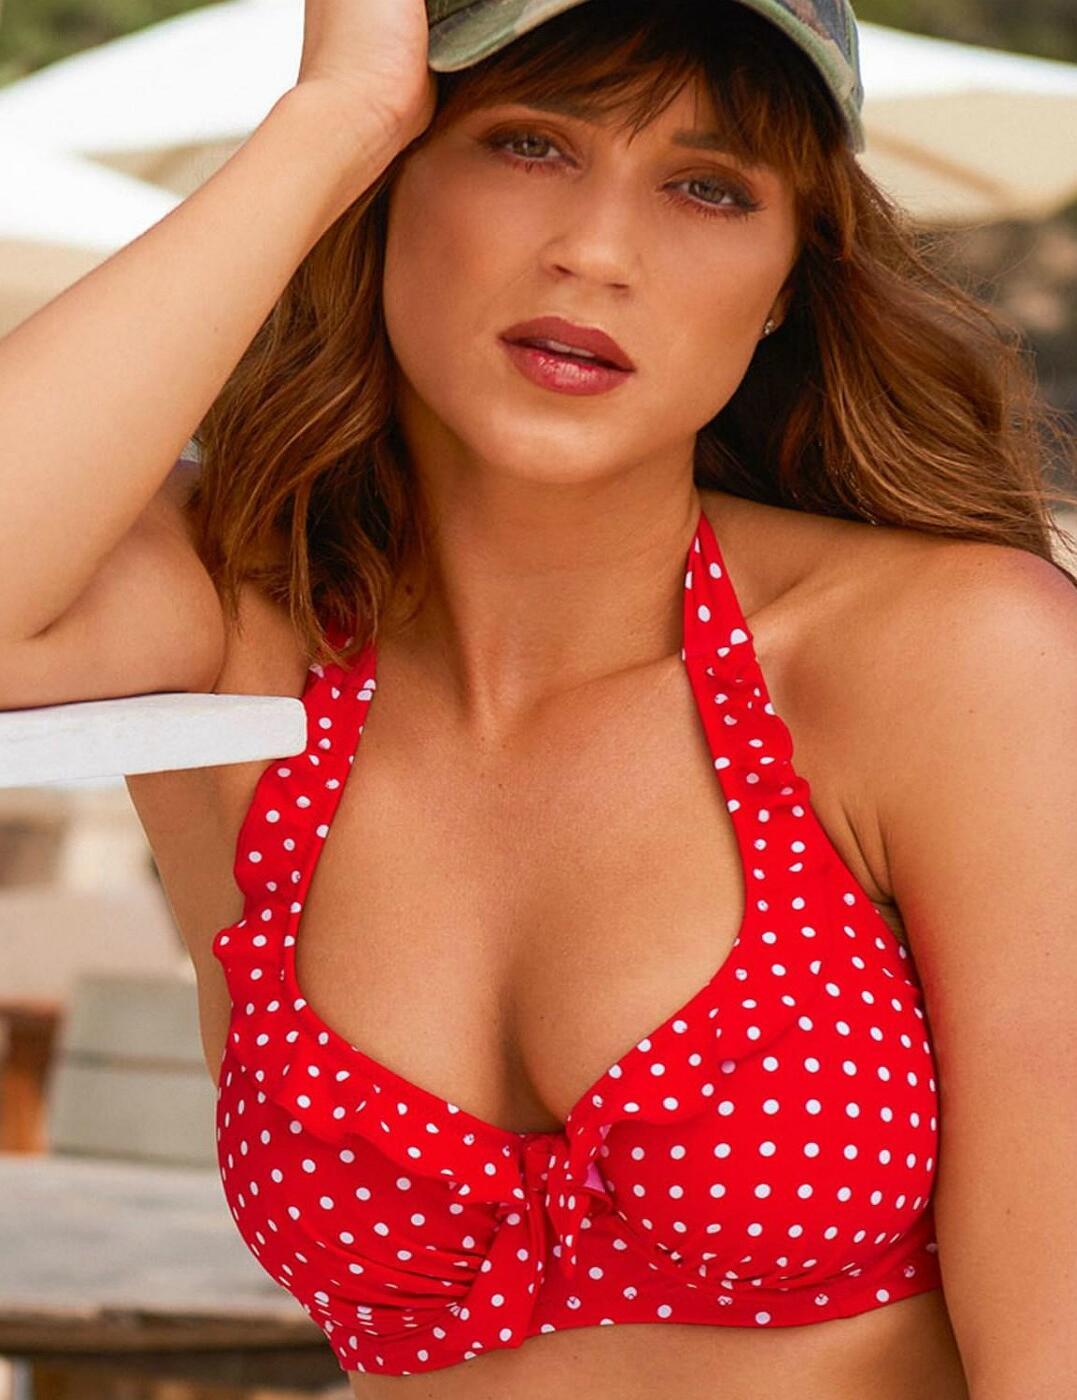 d9b5138456426 Pour Moi? Hot Spots Halter Bikini Top 3902 Red New Pour Moi Swimwear ...